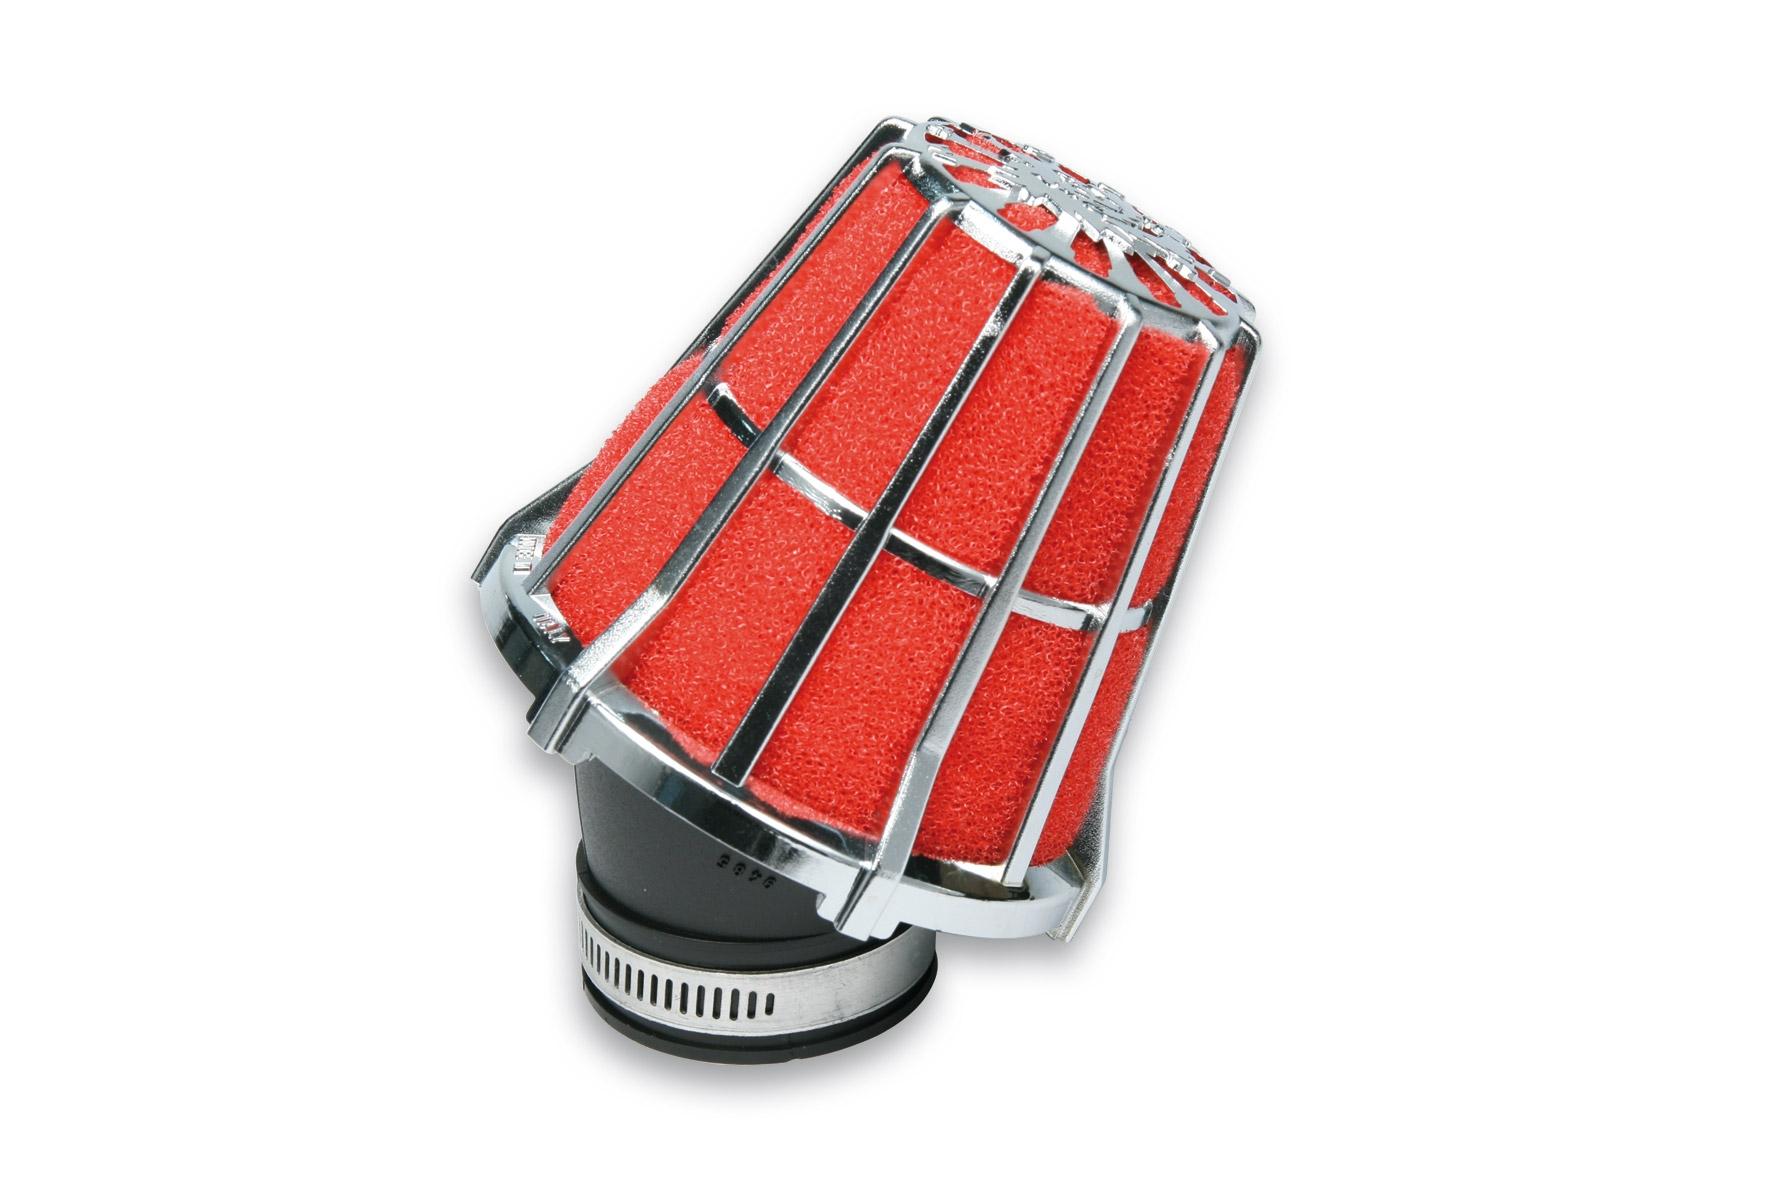 Filtre à air Malossi Red Filter E5 D.52 incliné 30 chromé